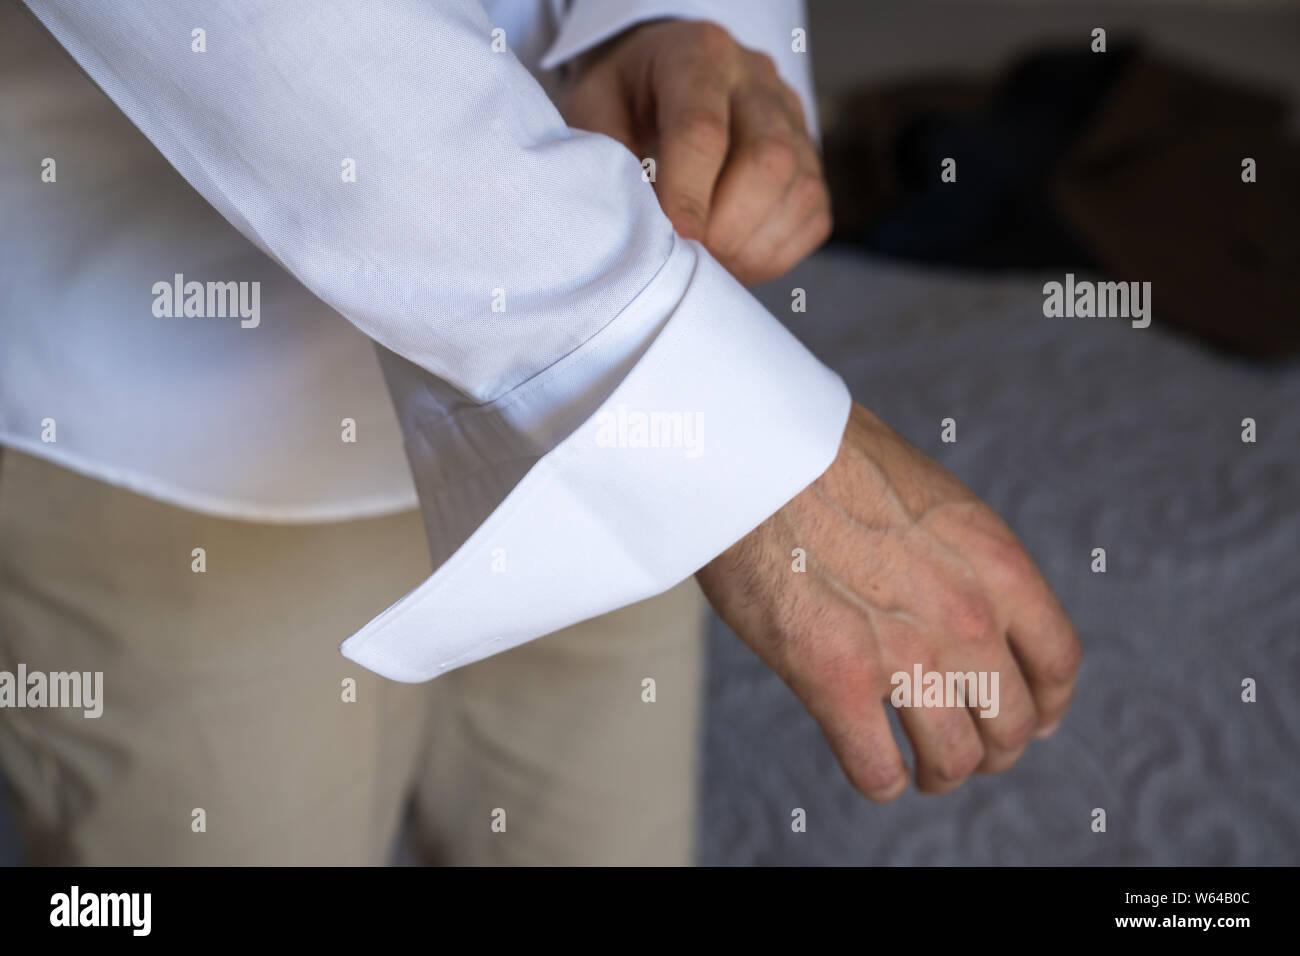 Pre Wedding Preparations. Groom getting ready for wedding ceremony. Greek, Cypriot wedding traditions Stock Photo